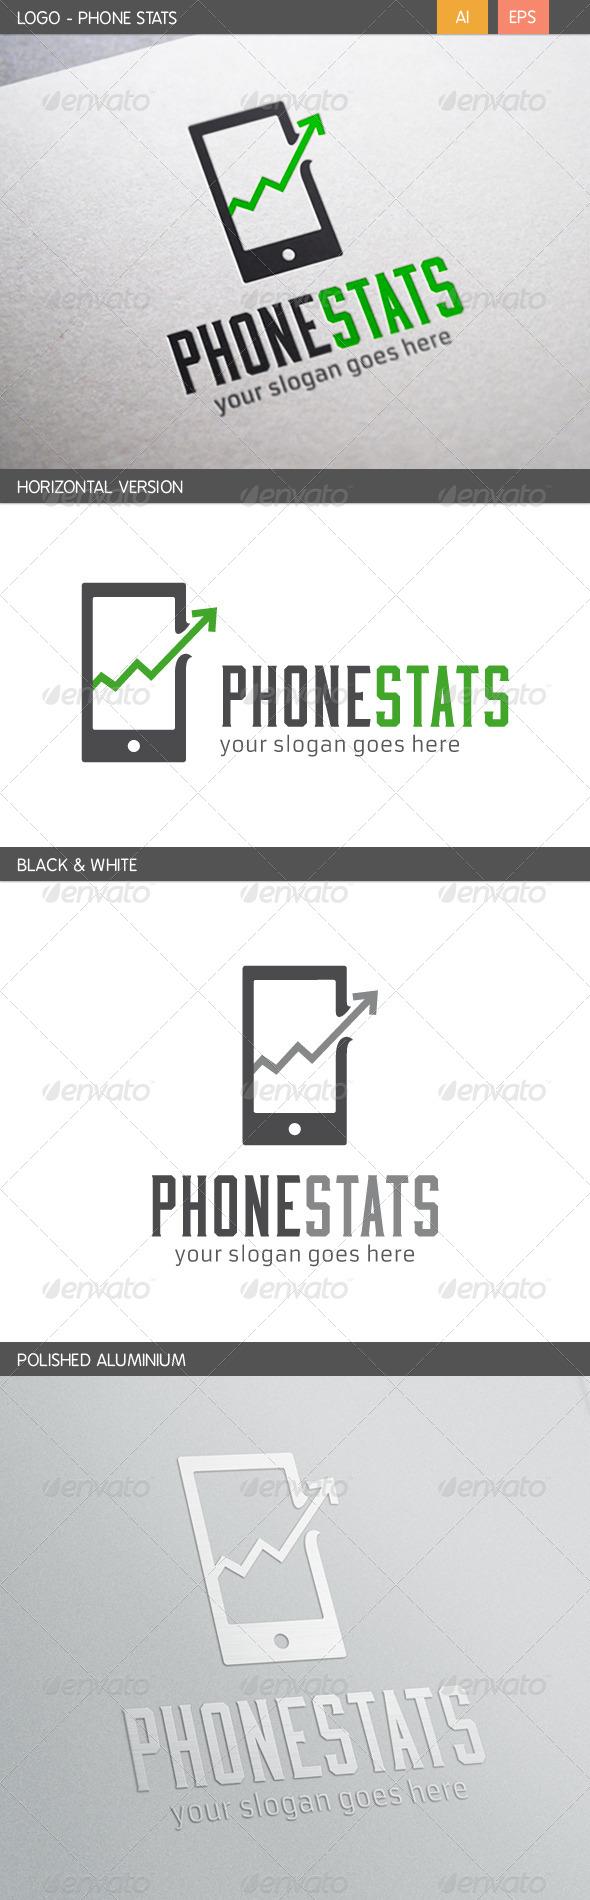 GraphicRiver Phone Stats Logo 6210815